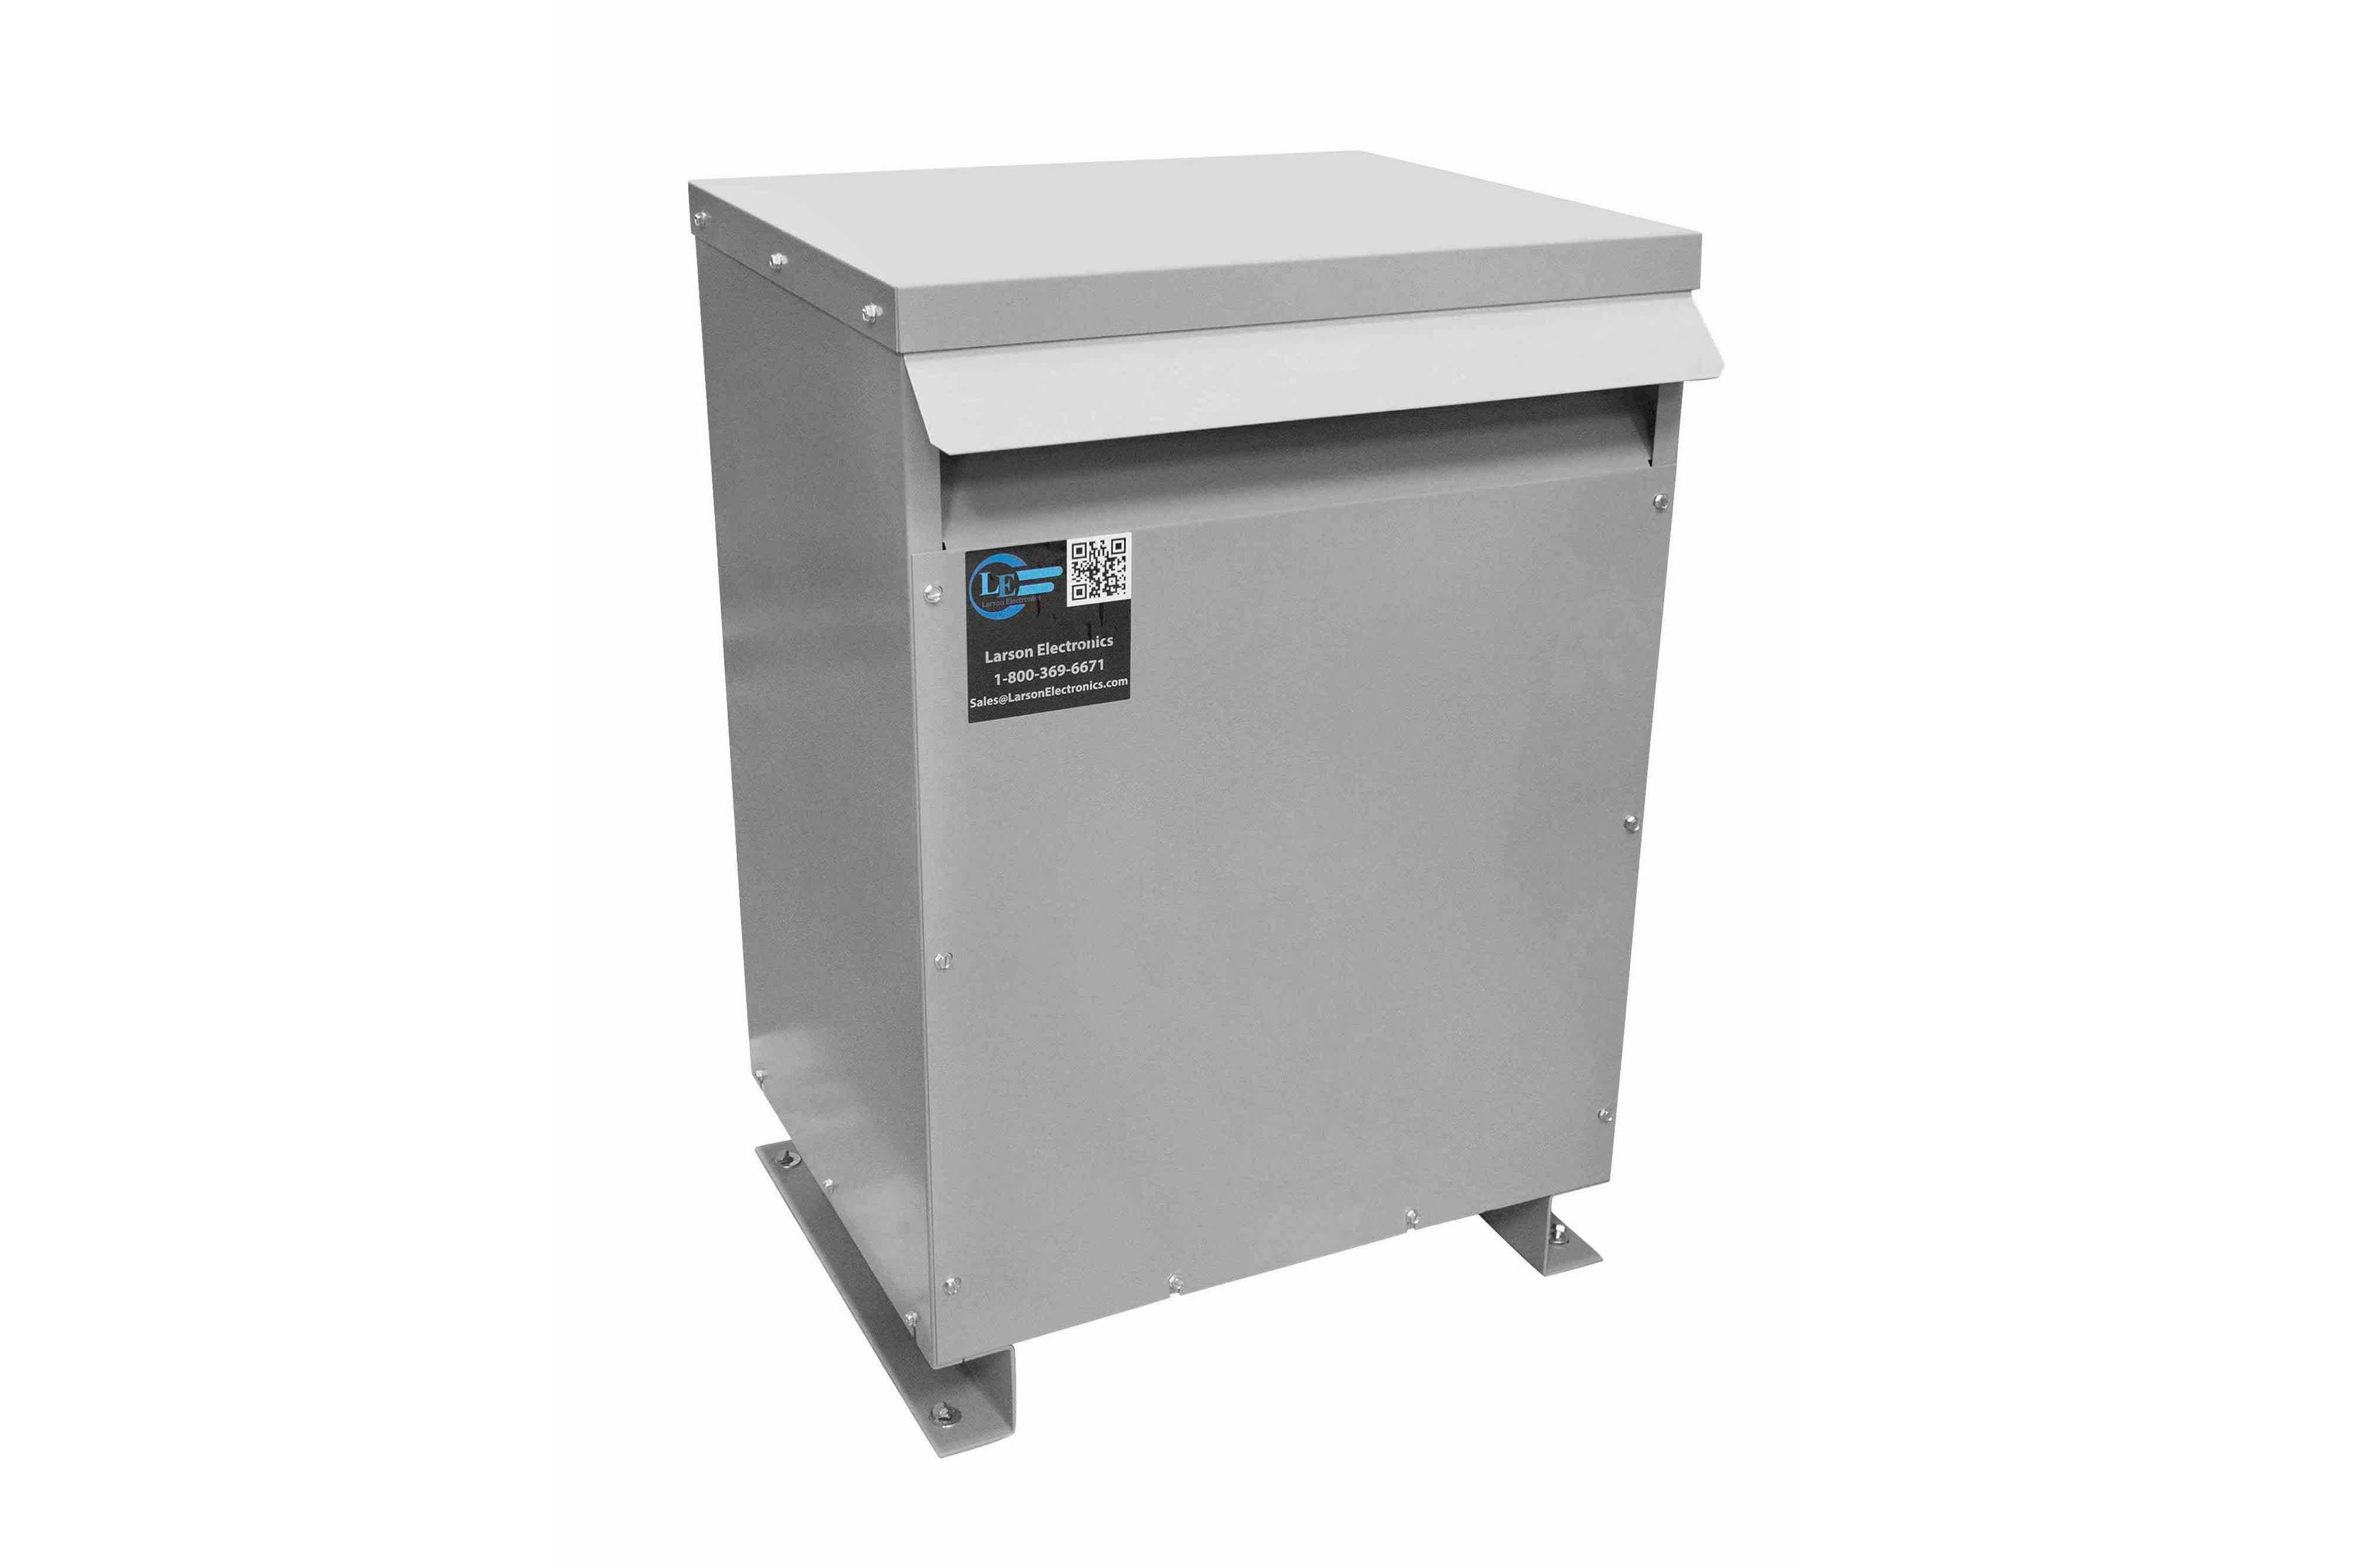 300 kVA 3PH DOE Transformer, 240V Delta Primary, 380Y/220 Wye-N Secondary, N3R, Ventilated, 60 Hz